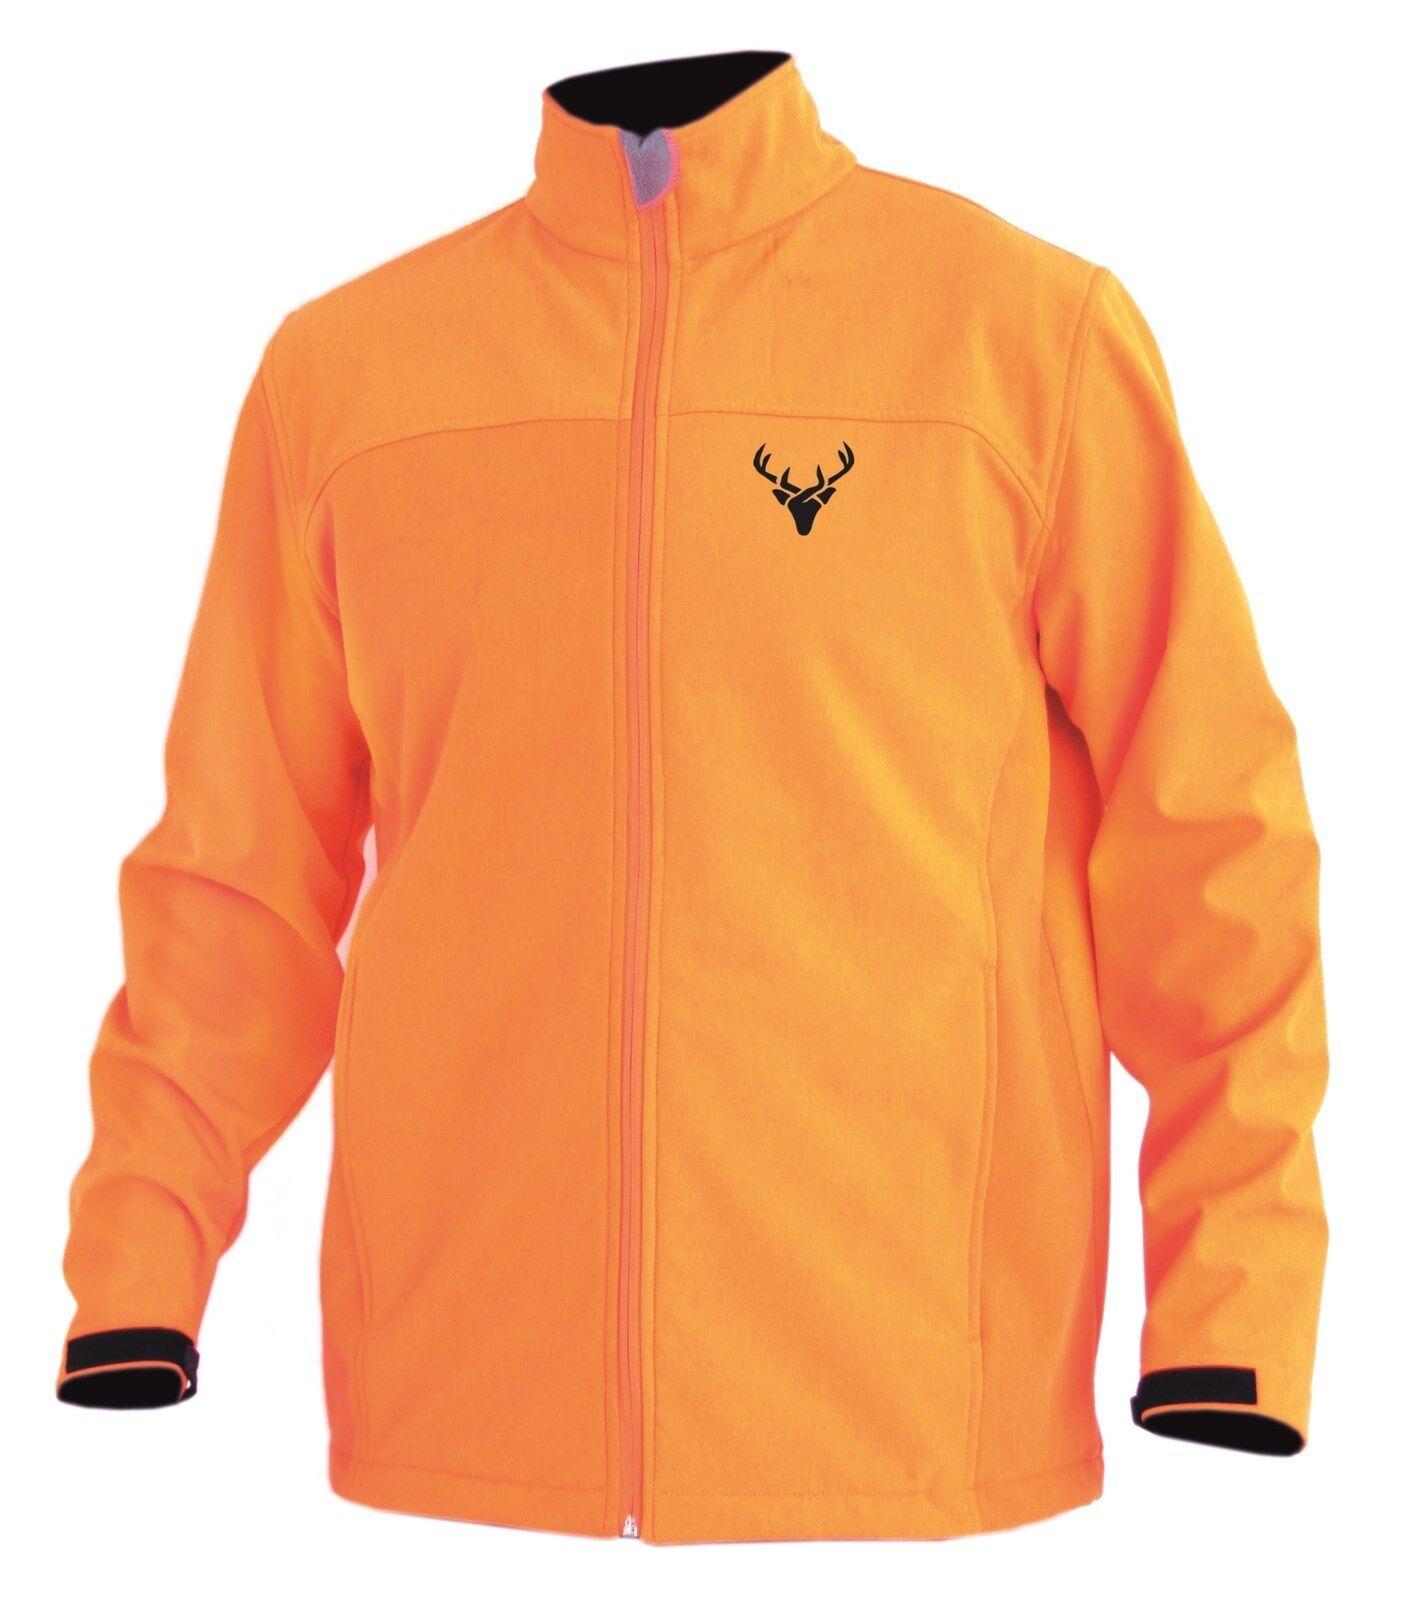 North Company TROPHY TROPHY TROPHY BLAZE Softshell Jacke Orange NEU ecc15e